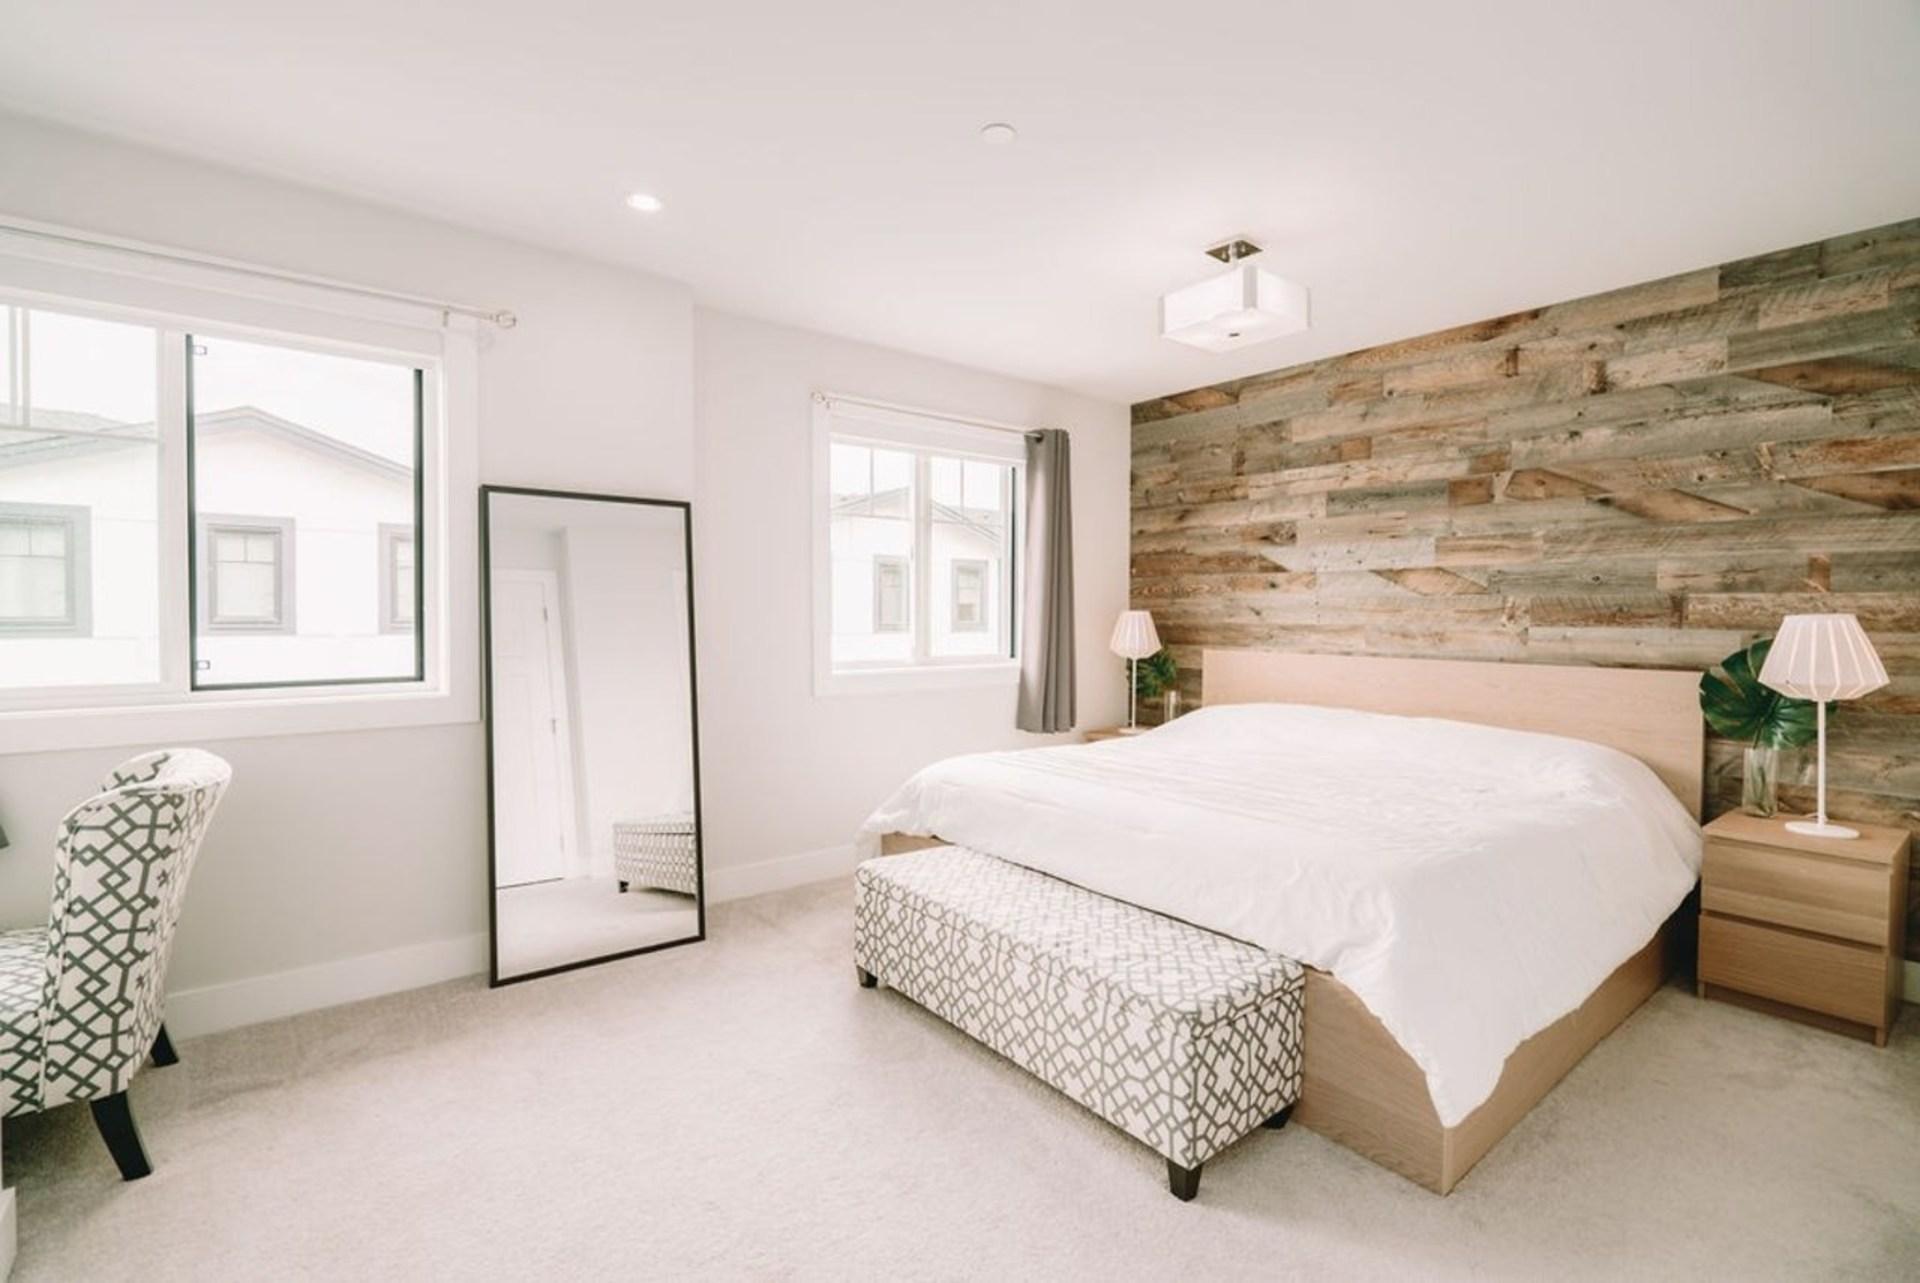 188-wood-street-queensborough-new-westminster-20 of 50 - 188 Wood Street, Queensborough, New Westminster